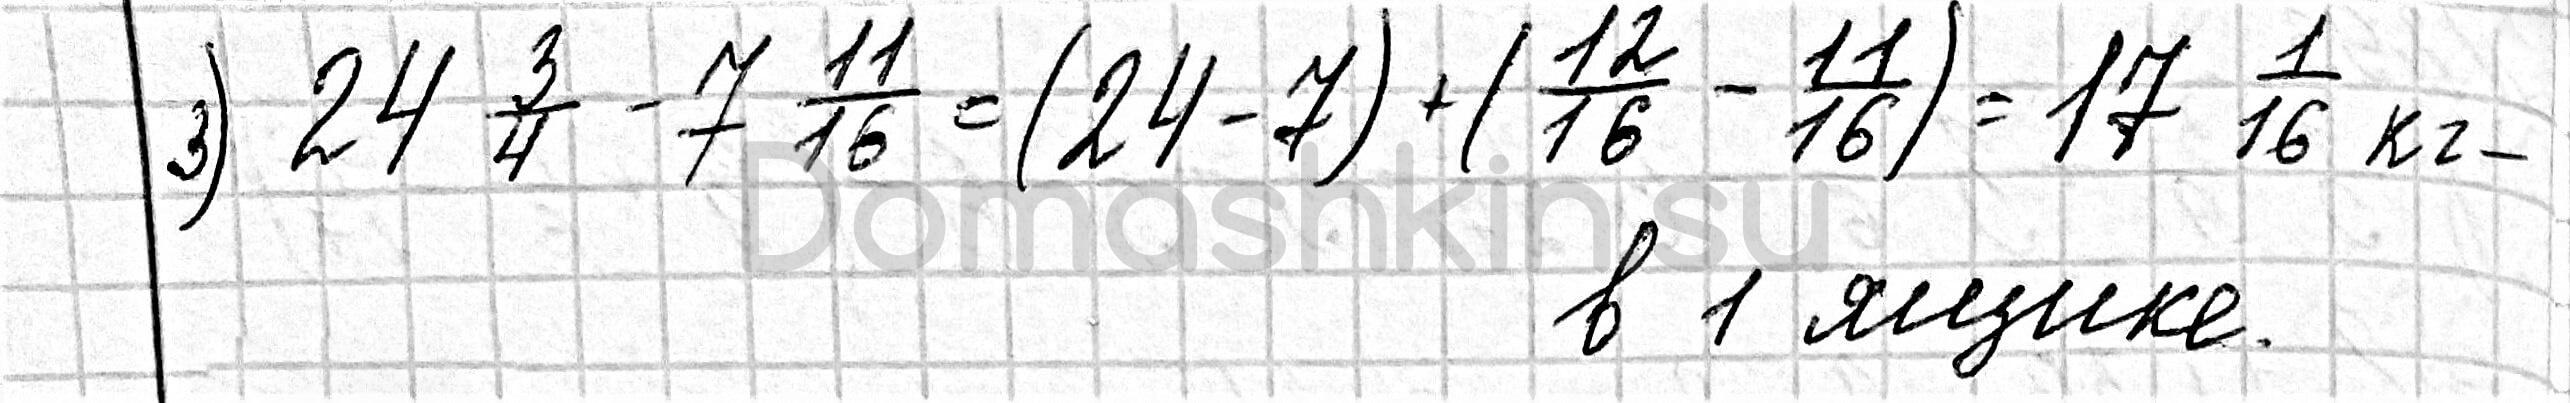 Математика 6 класс учебник Мерзляк номер 294 решение